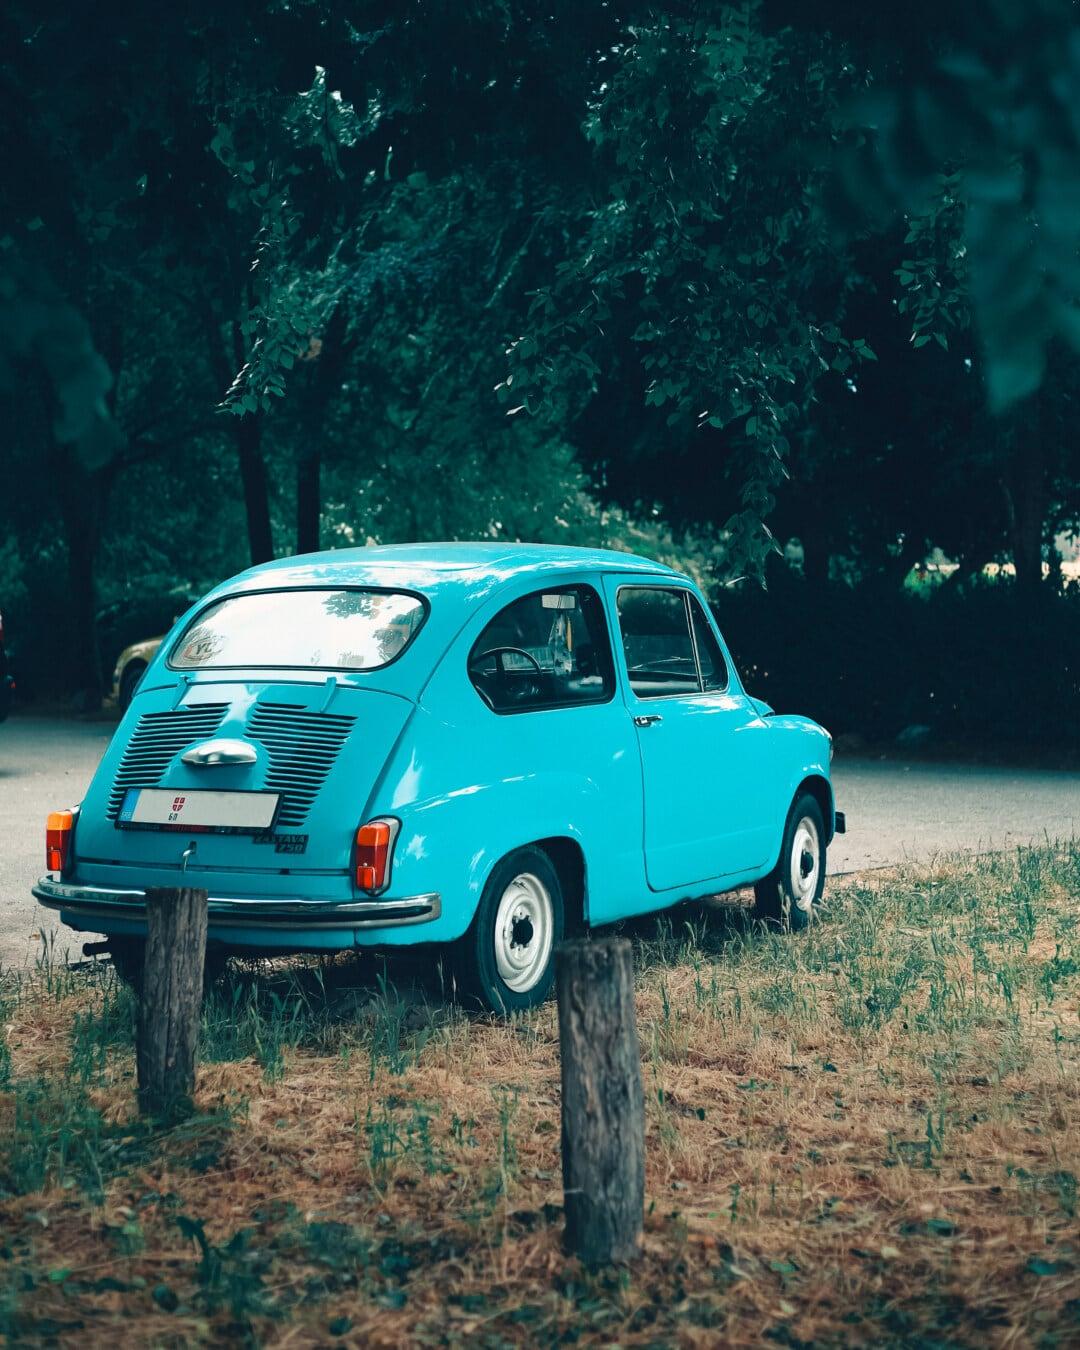 small, oldtimer, car, nostalgia, Yugoslavia, Serbia, transport, drive, transportation, automobile